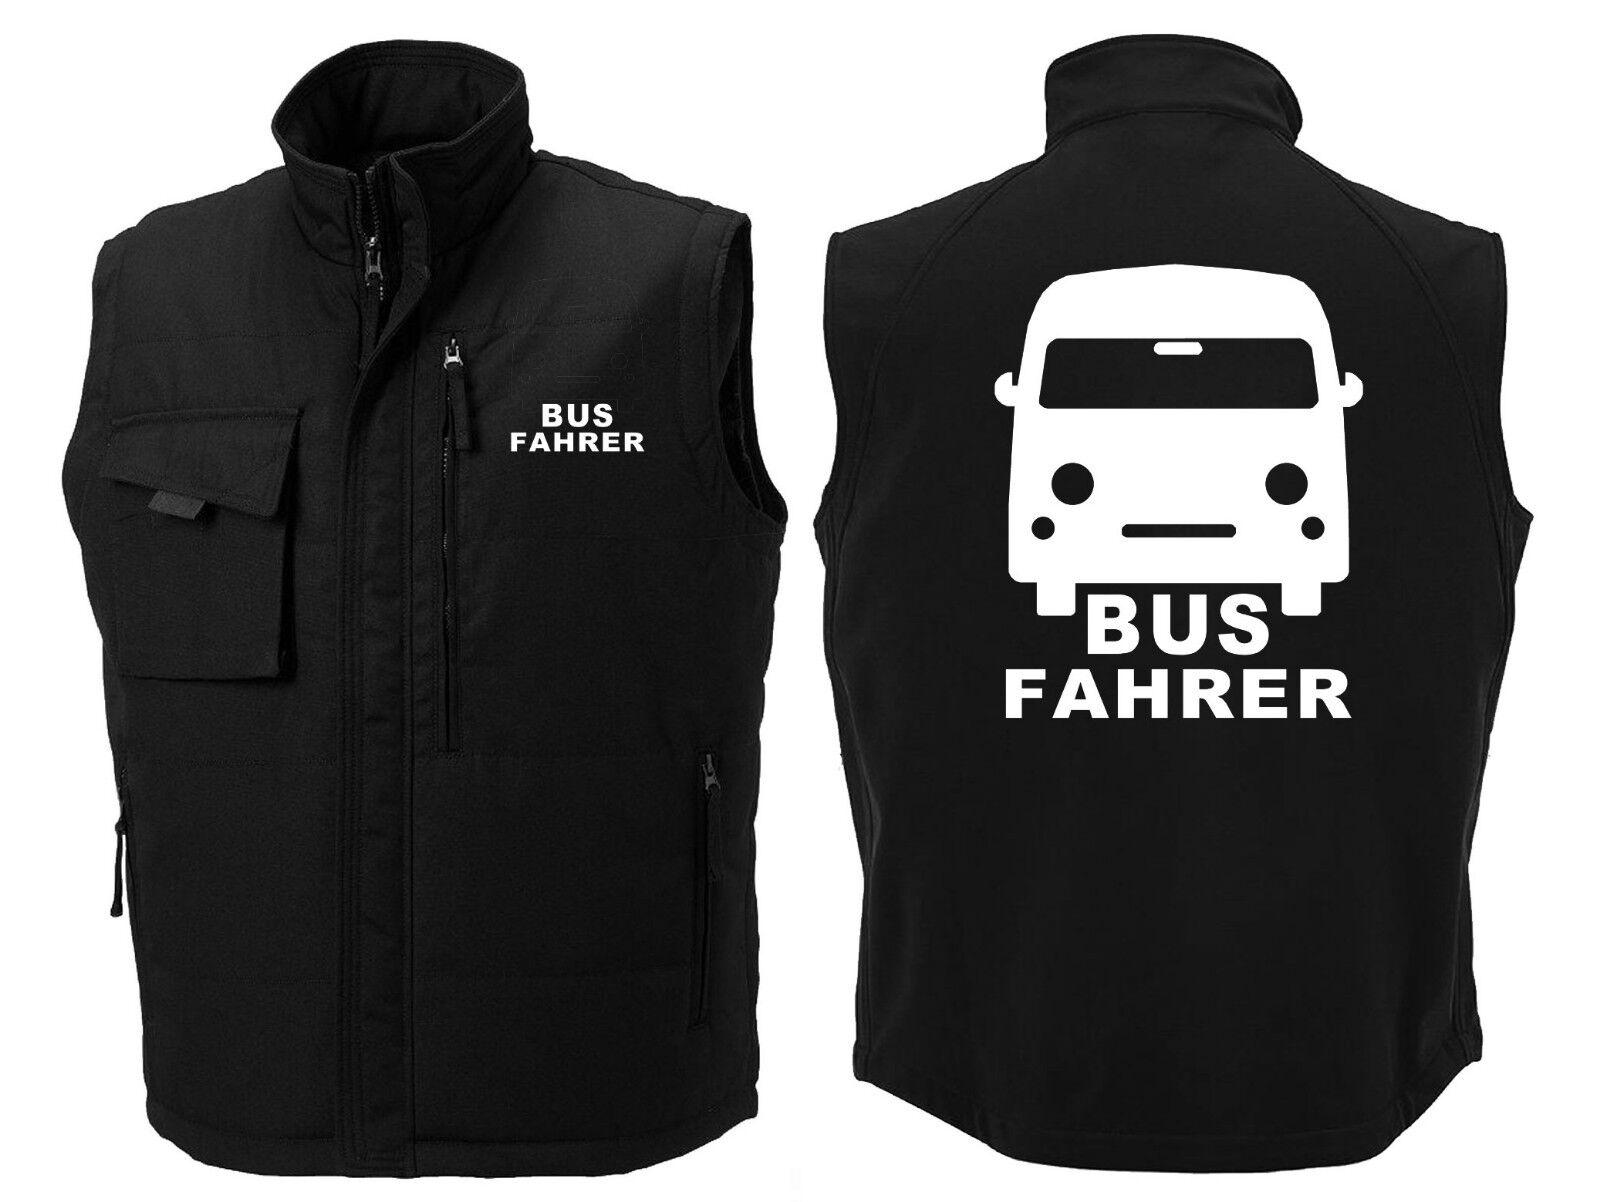 Fahrer Weste   Busfahrer   Omnibus   Schulbus   Reise   Fernbus        102-37-02